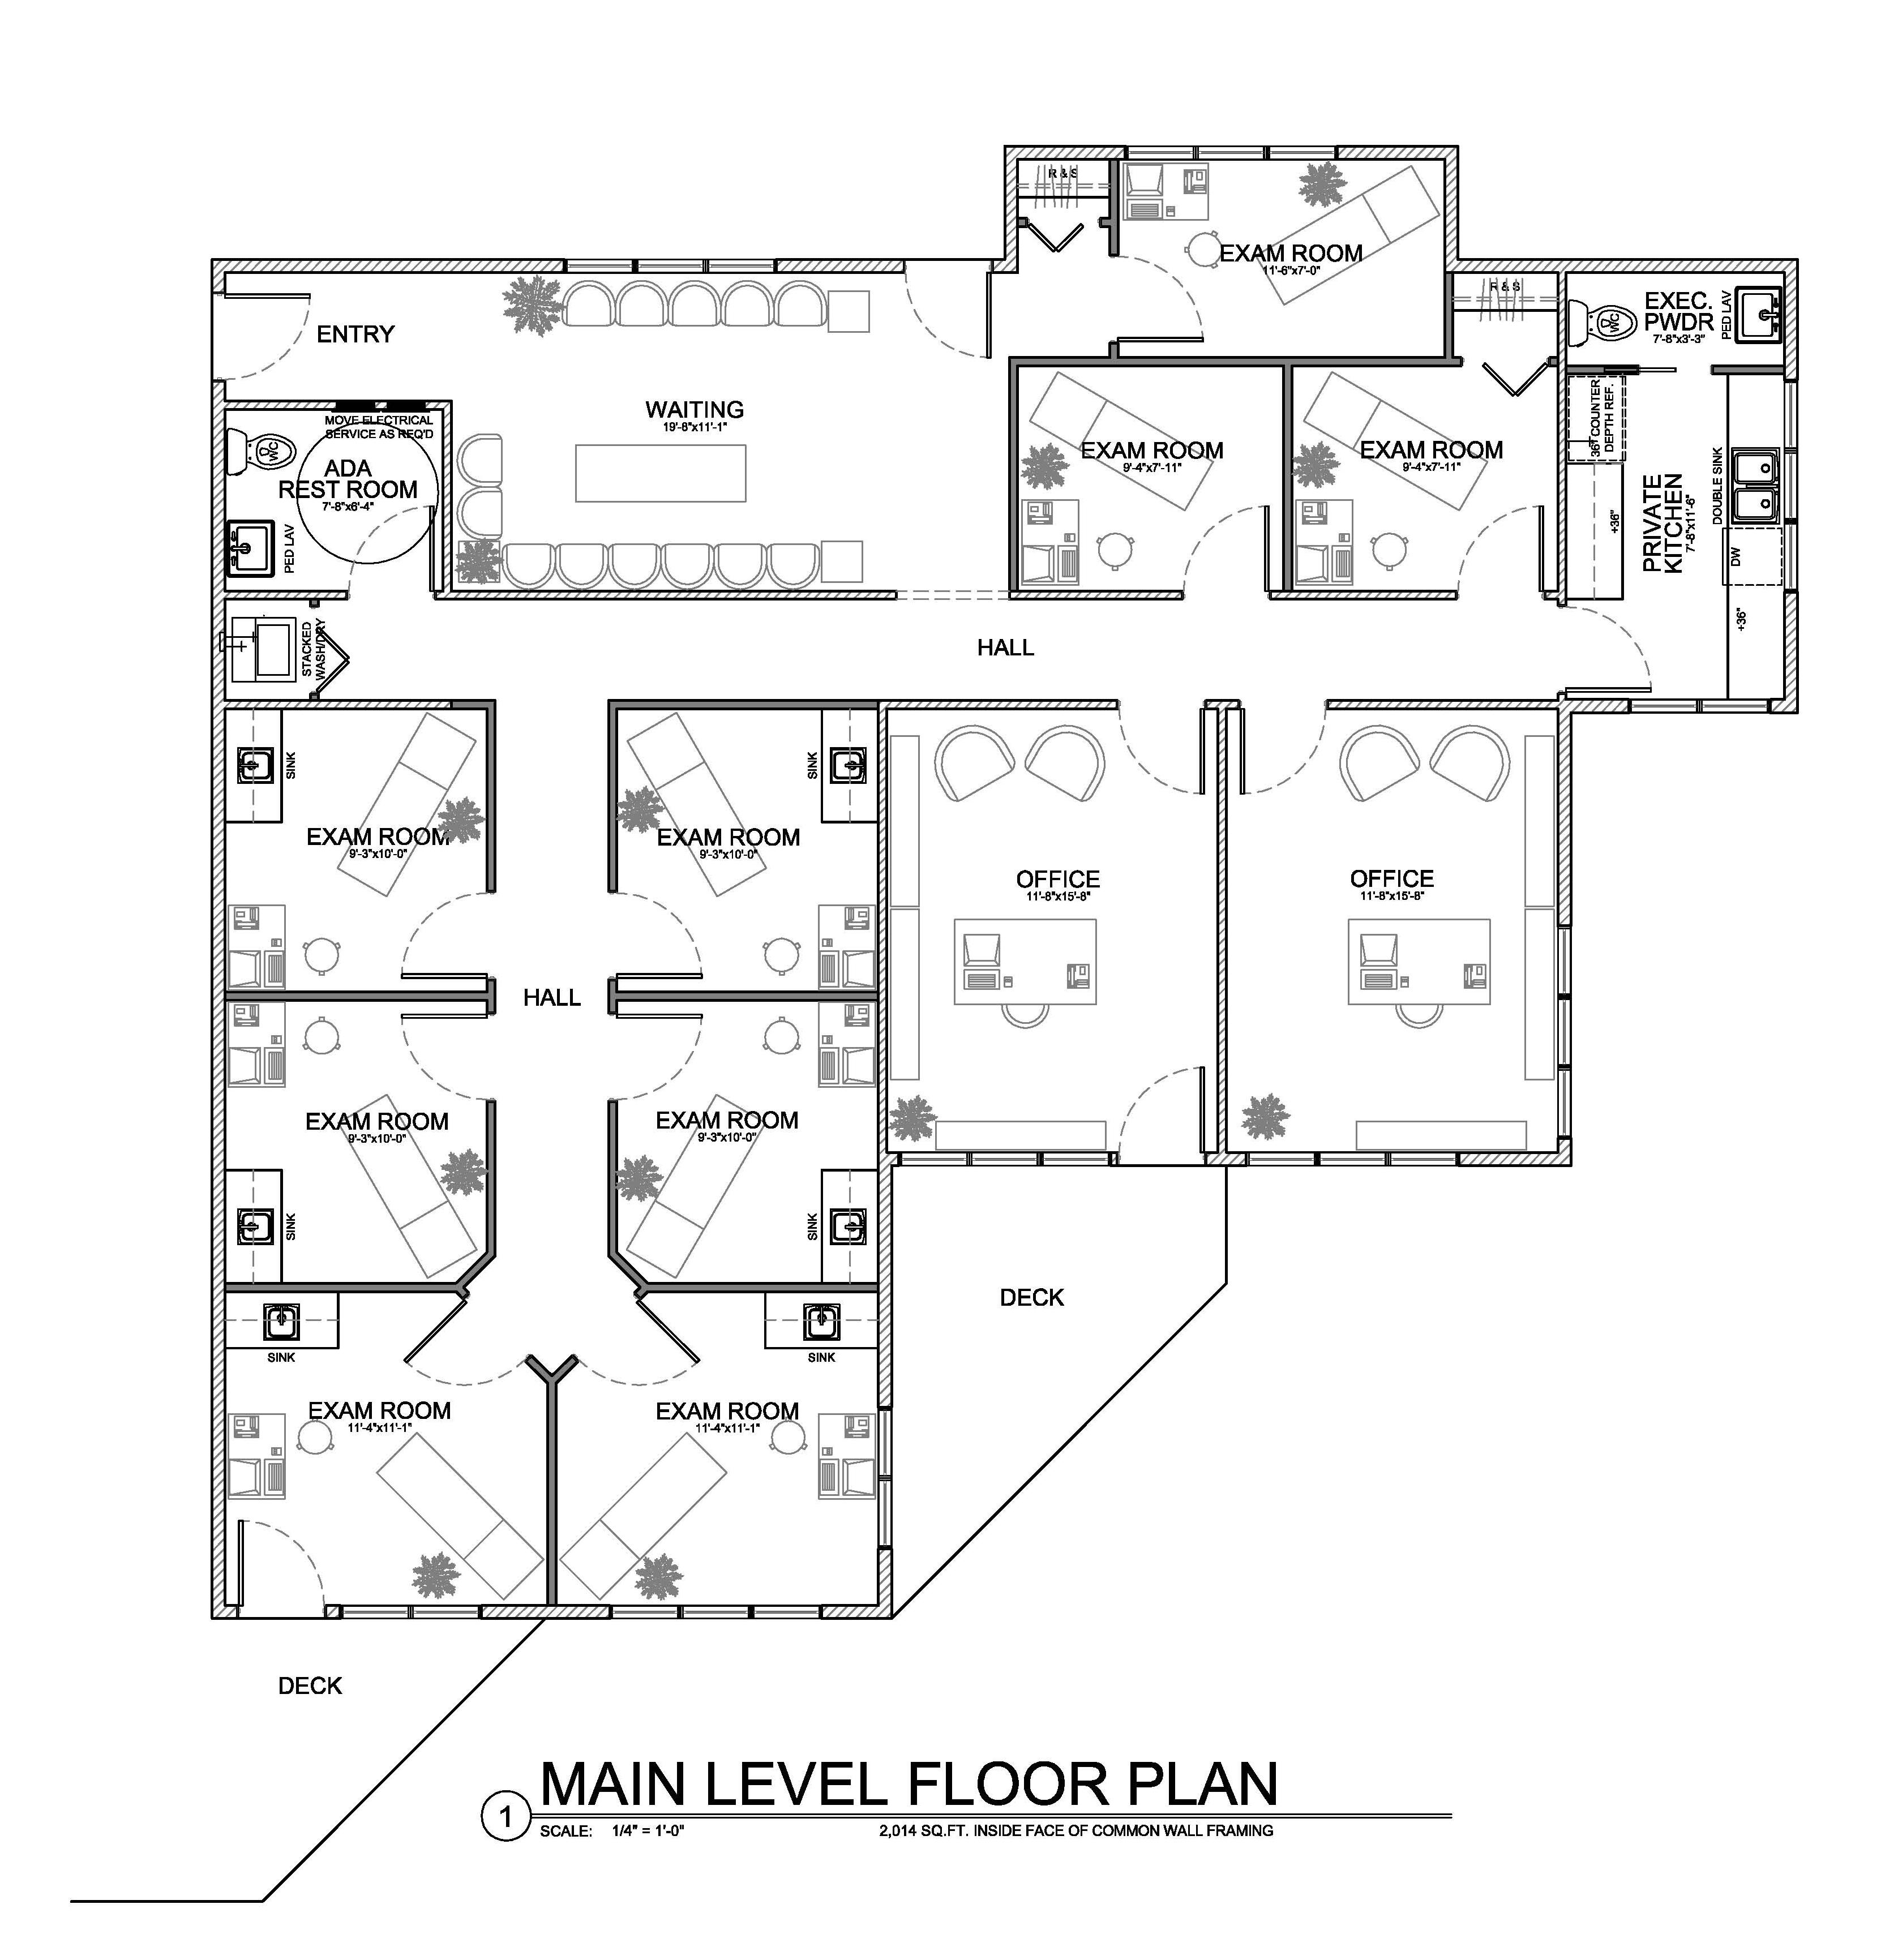 Floor Plan For Small Medical Office Evstudio